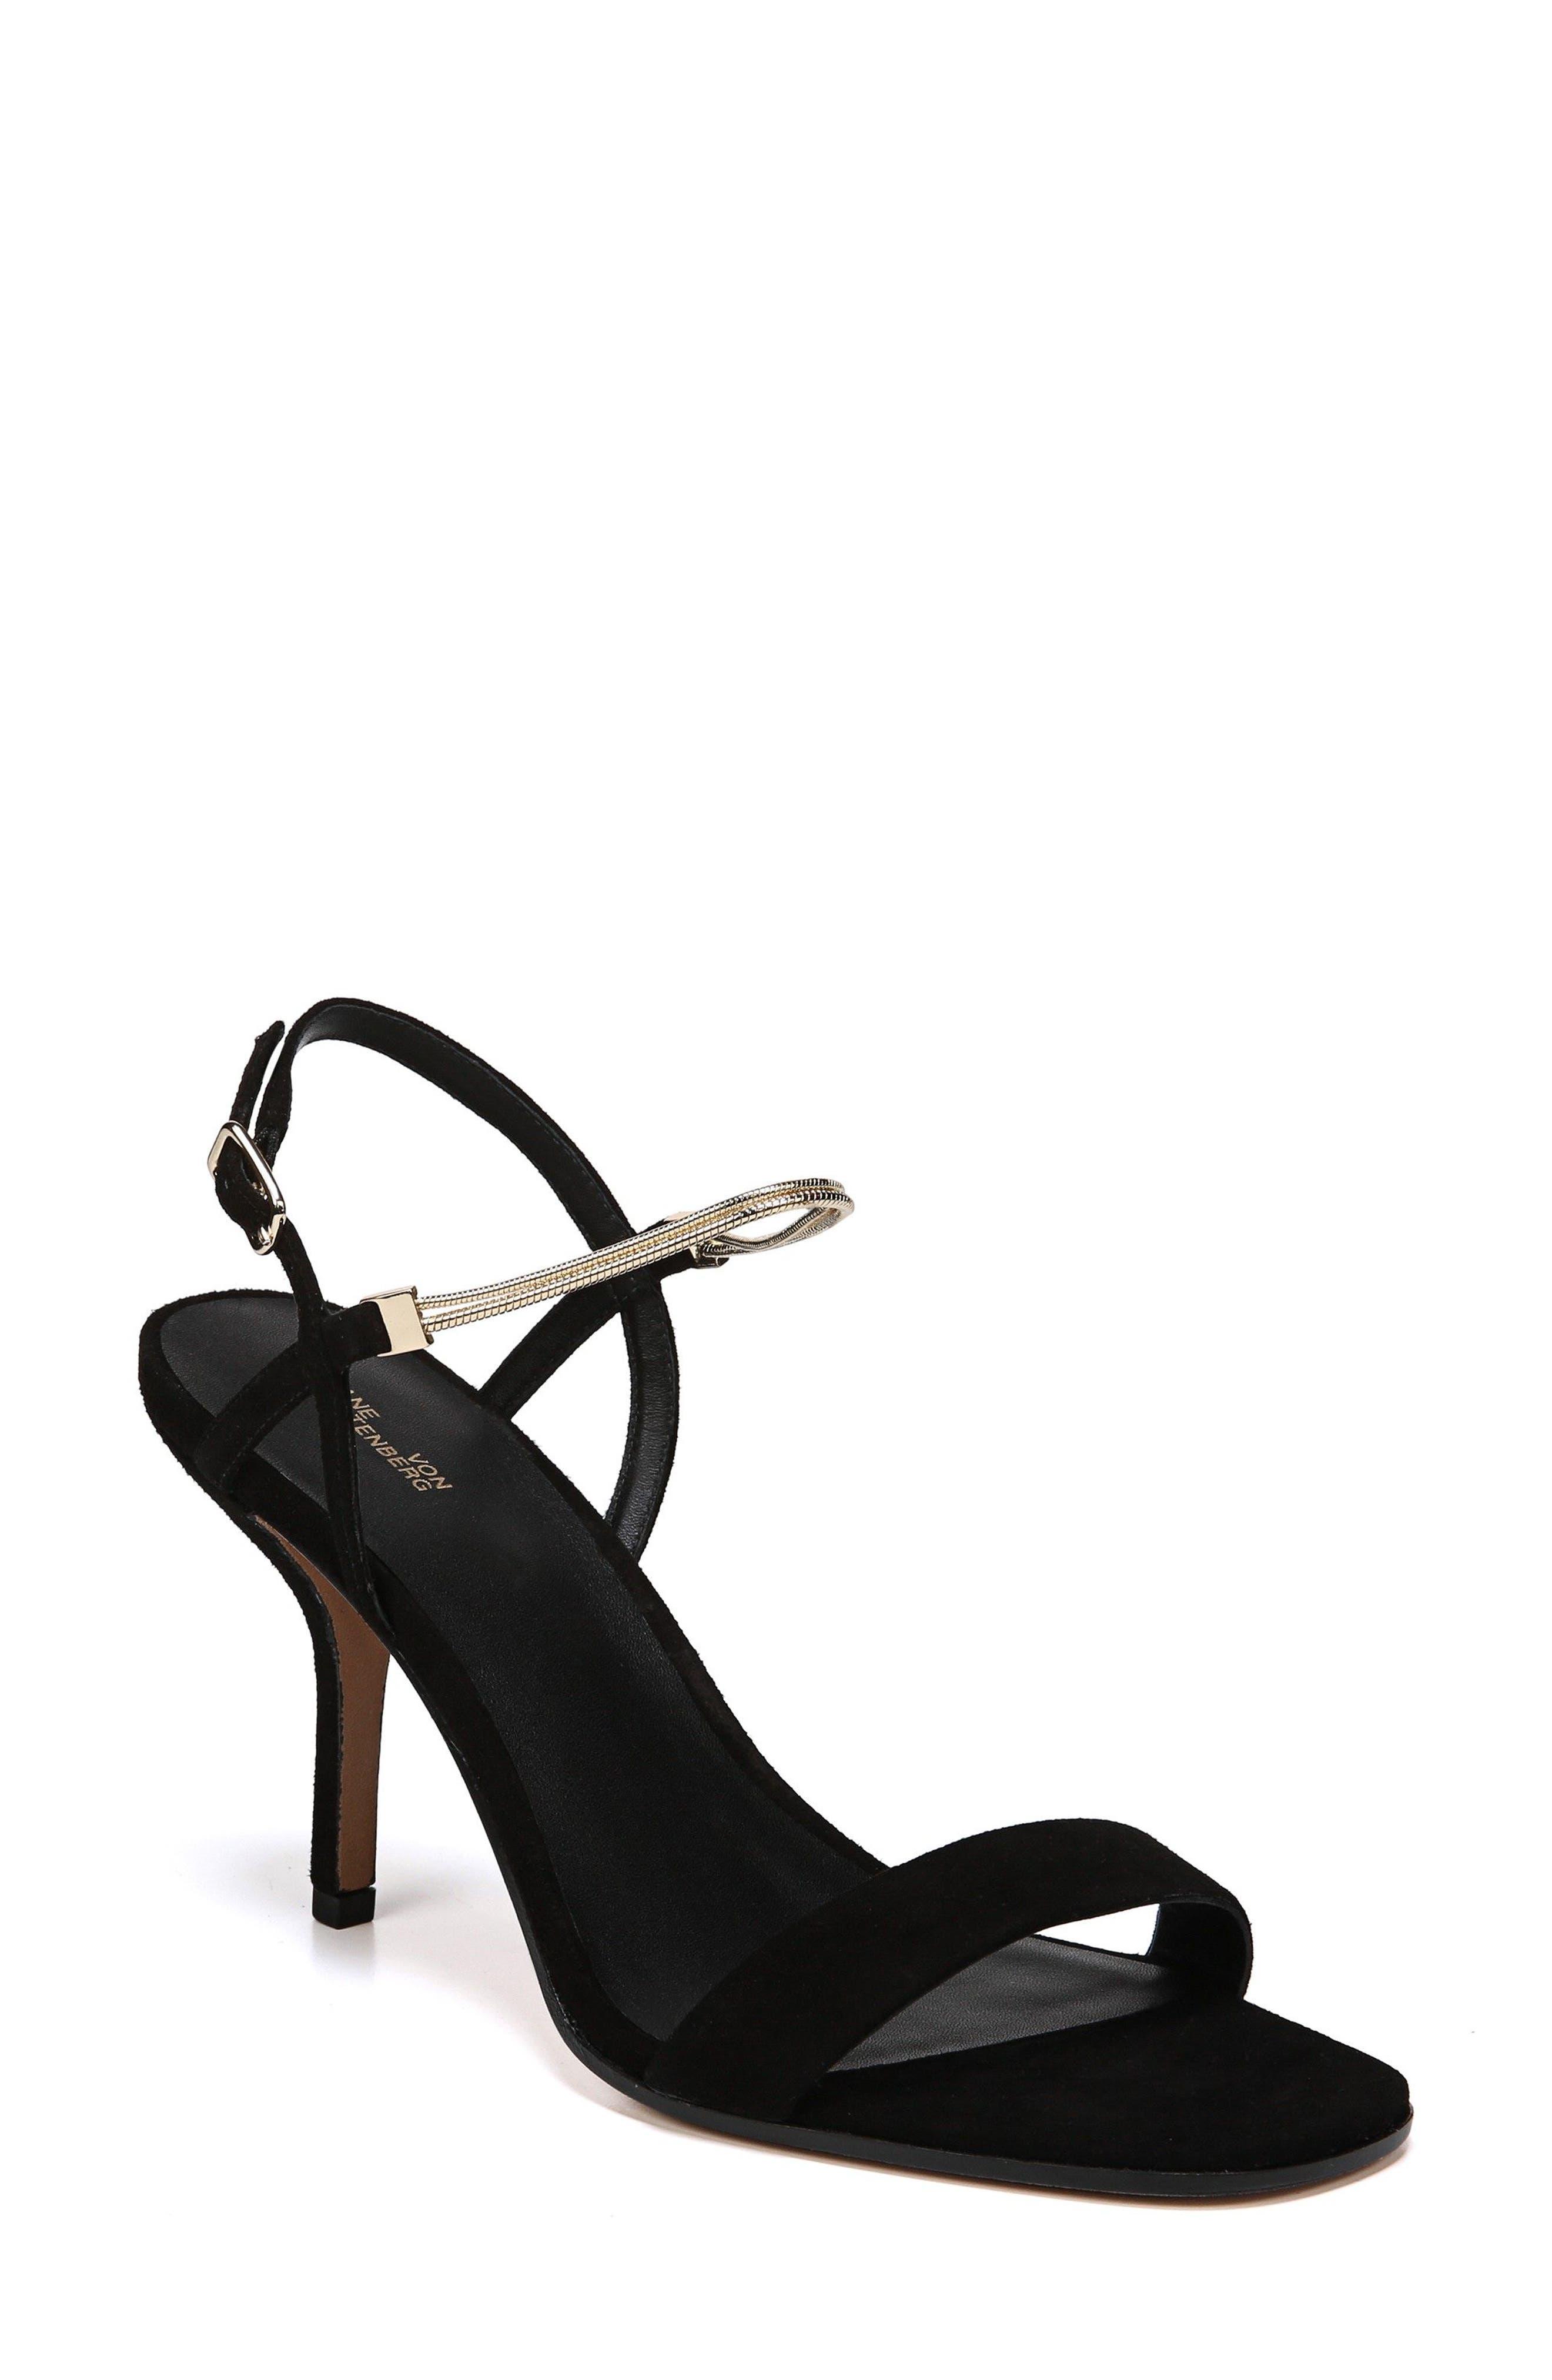 Frankie Sandal,                         Main,                         color, BLACK